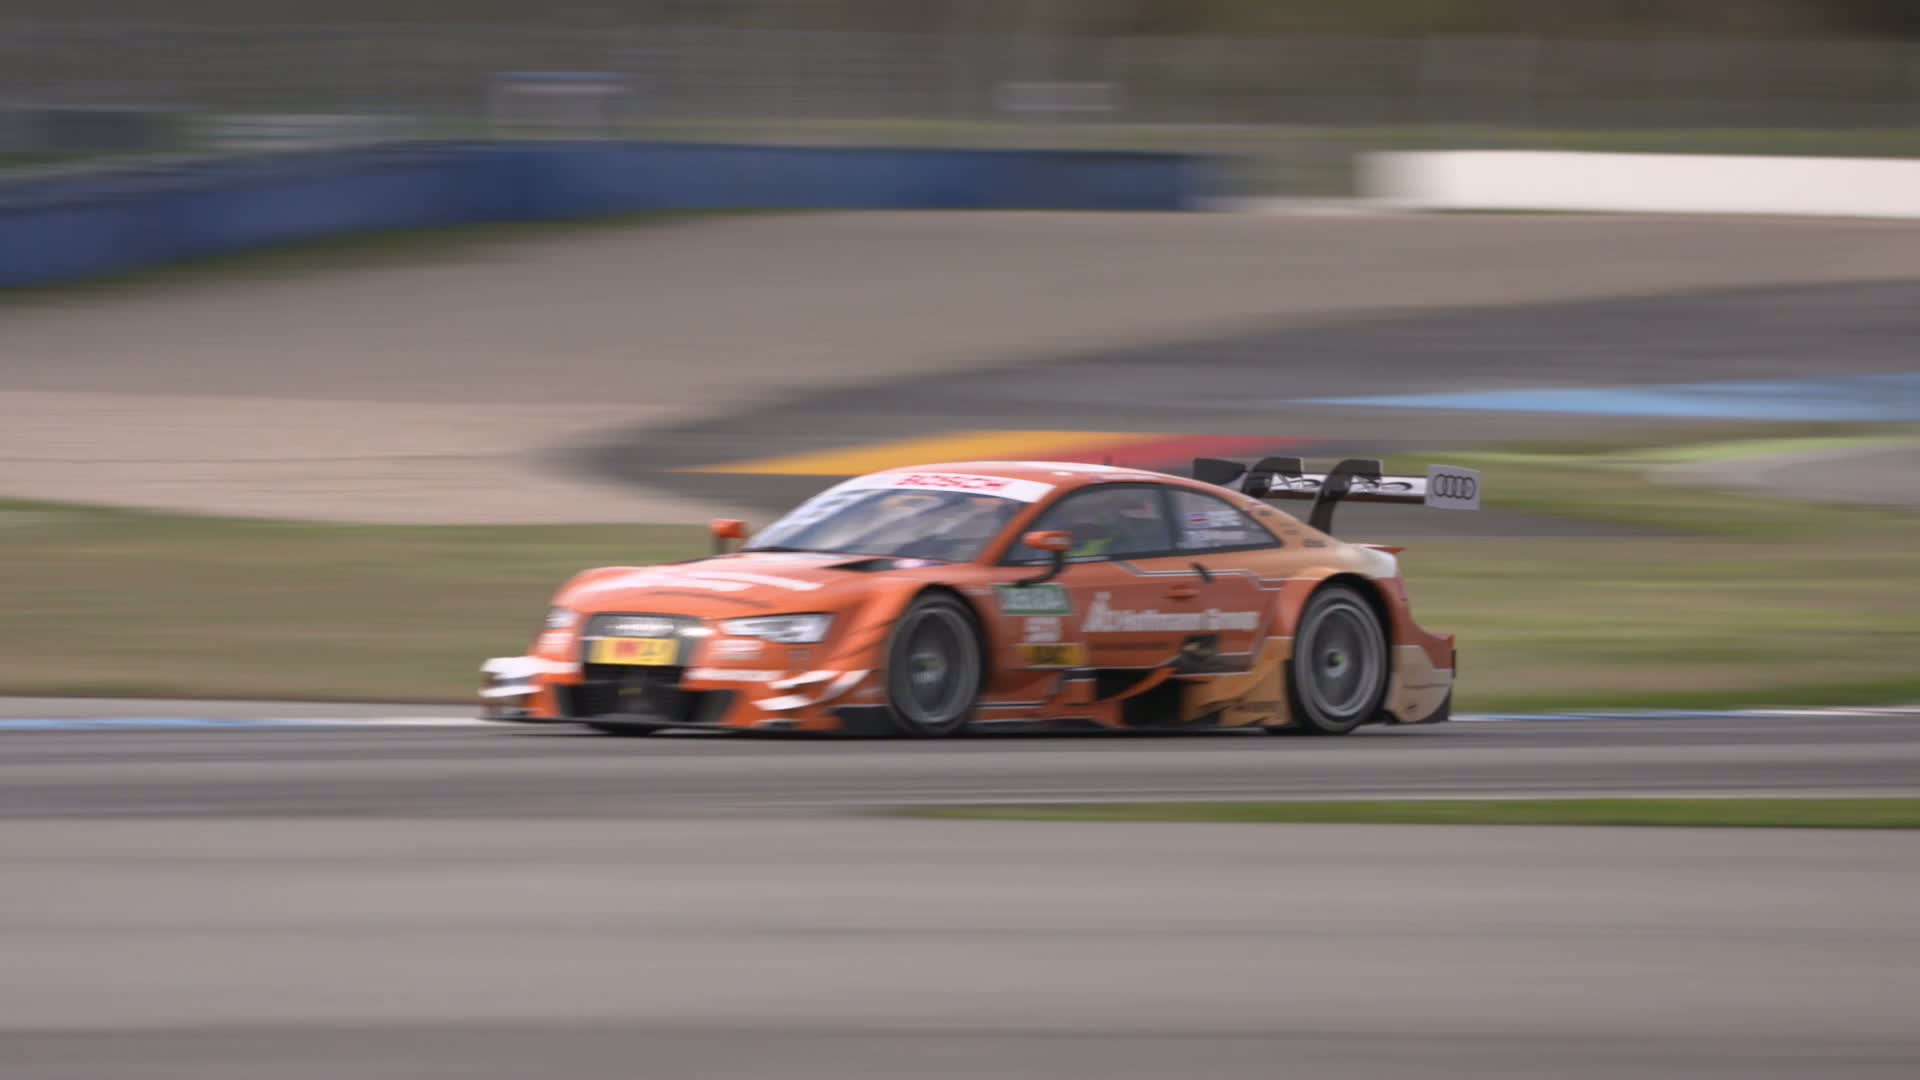 60 Seconds of Audi Sport 3/2016 – DTM Tests Hockenheimring